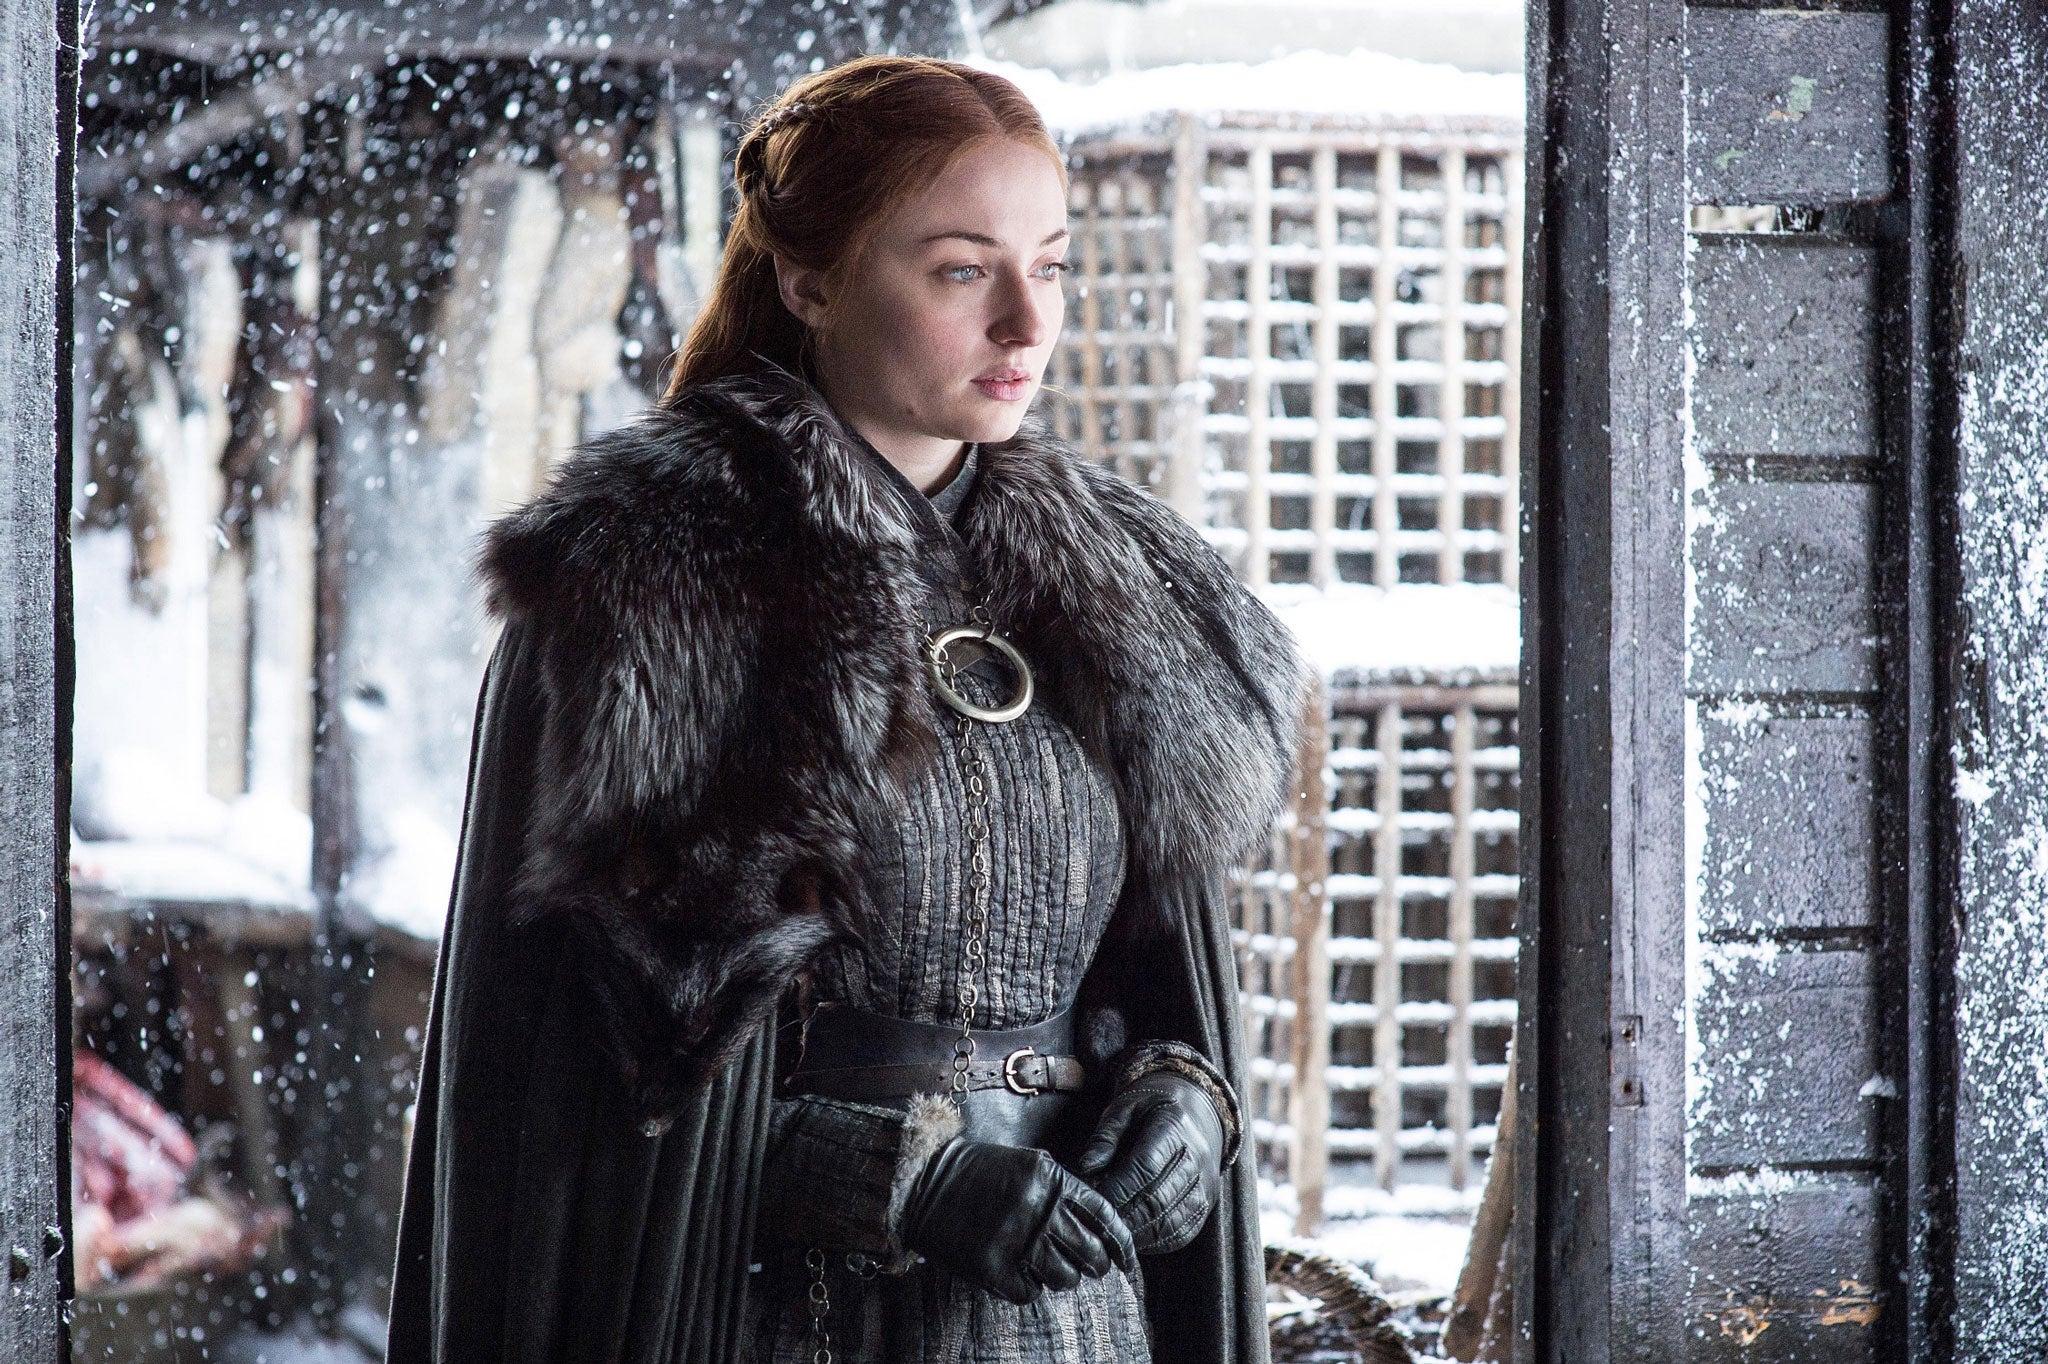 706-Winterfell-Sansa-1_2048px.jpg